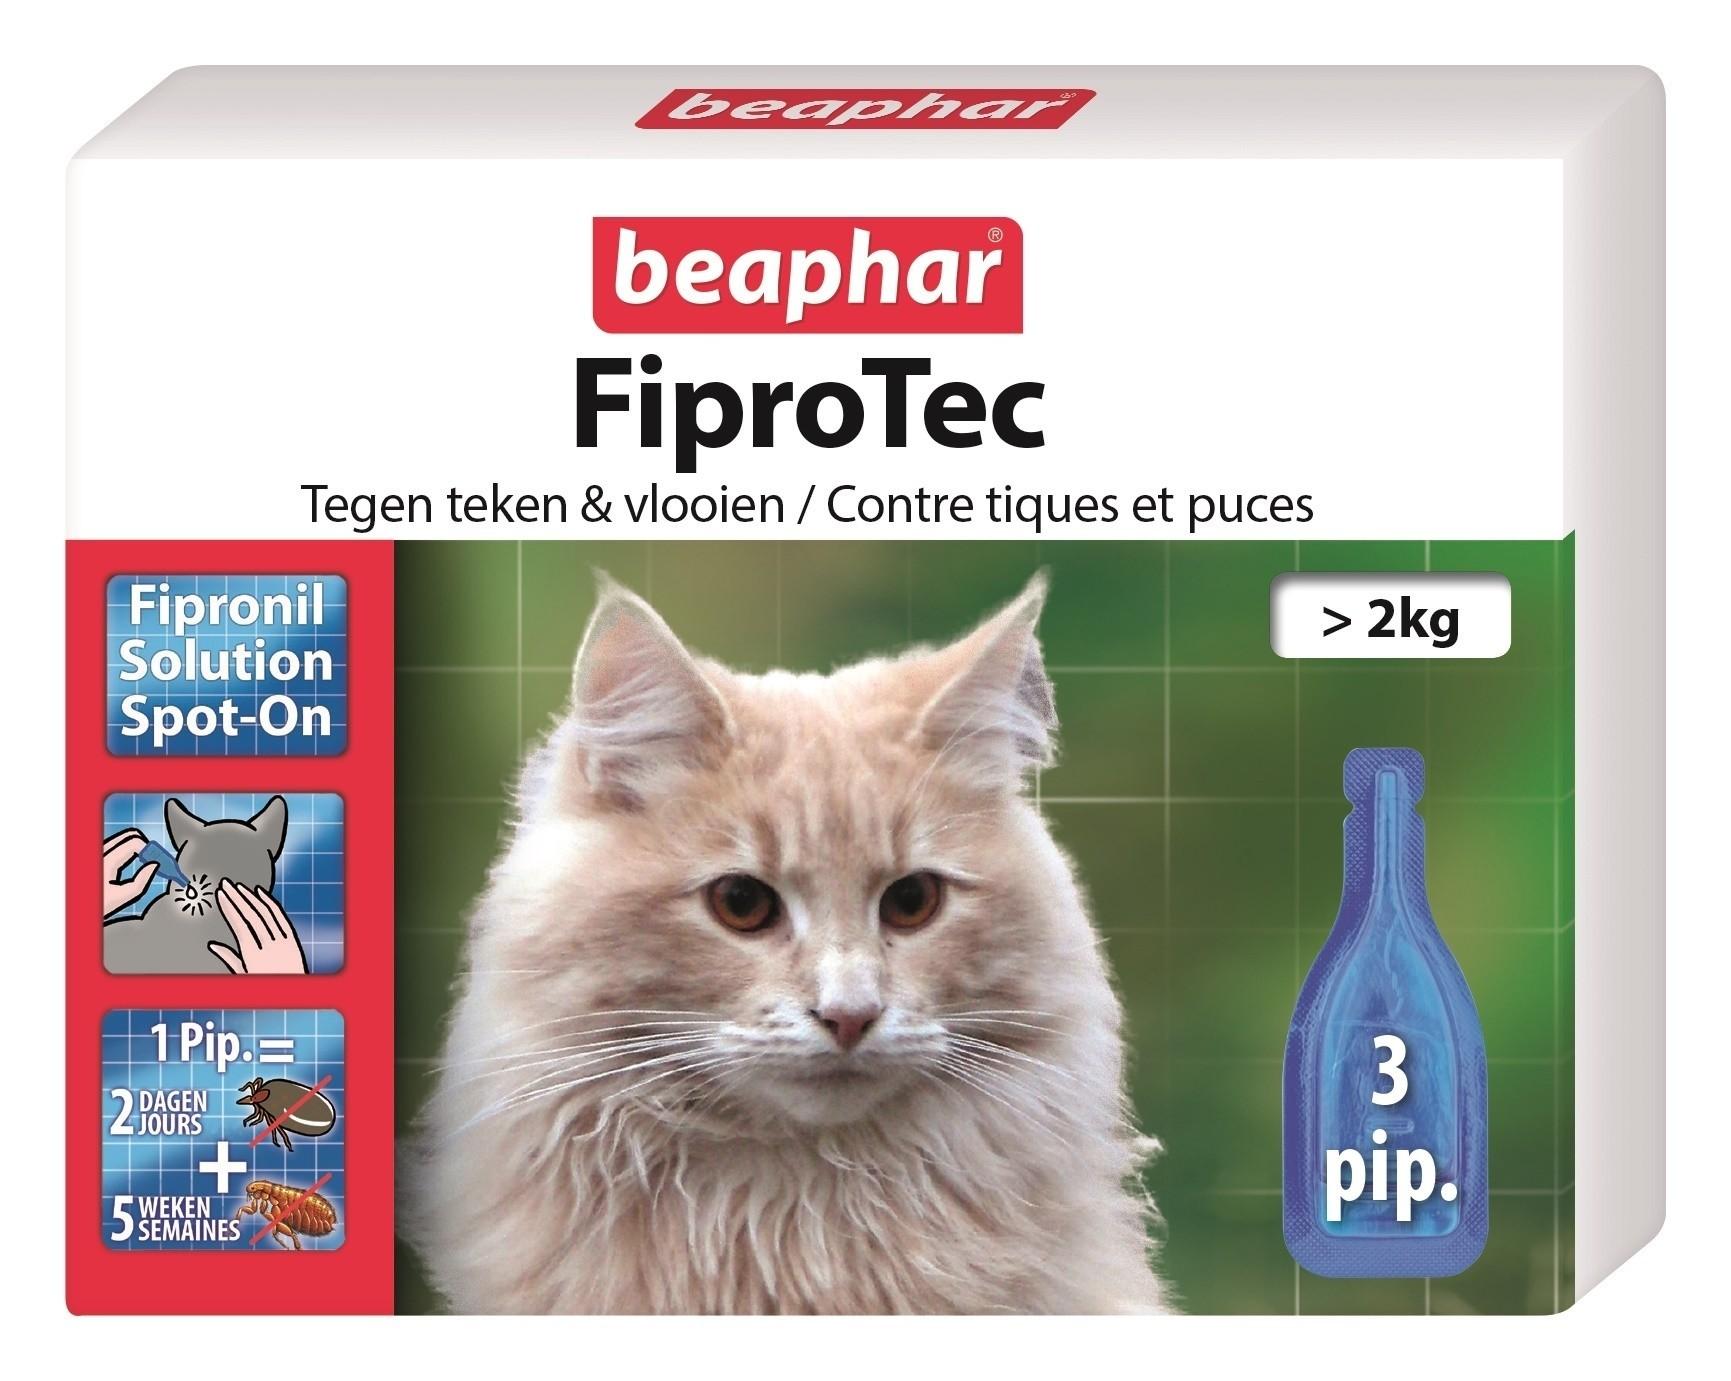 Beaphar Fiprotec kat vlooien/teken 3 pipet